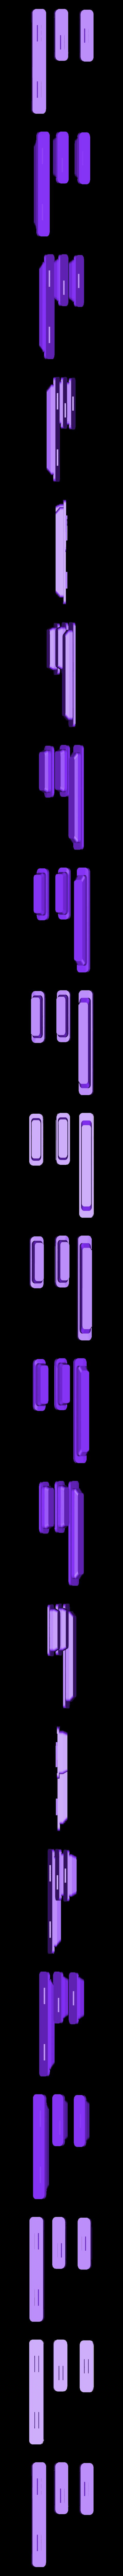 cova102_buttons.stl Download free STL file Fairphone 2 cover • 3D printer model, unwohlpol